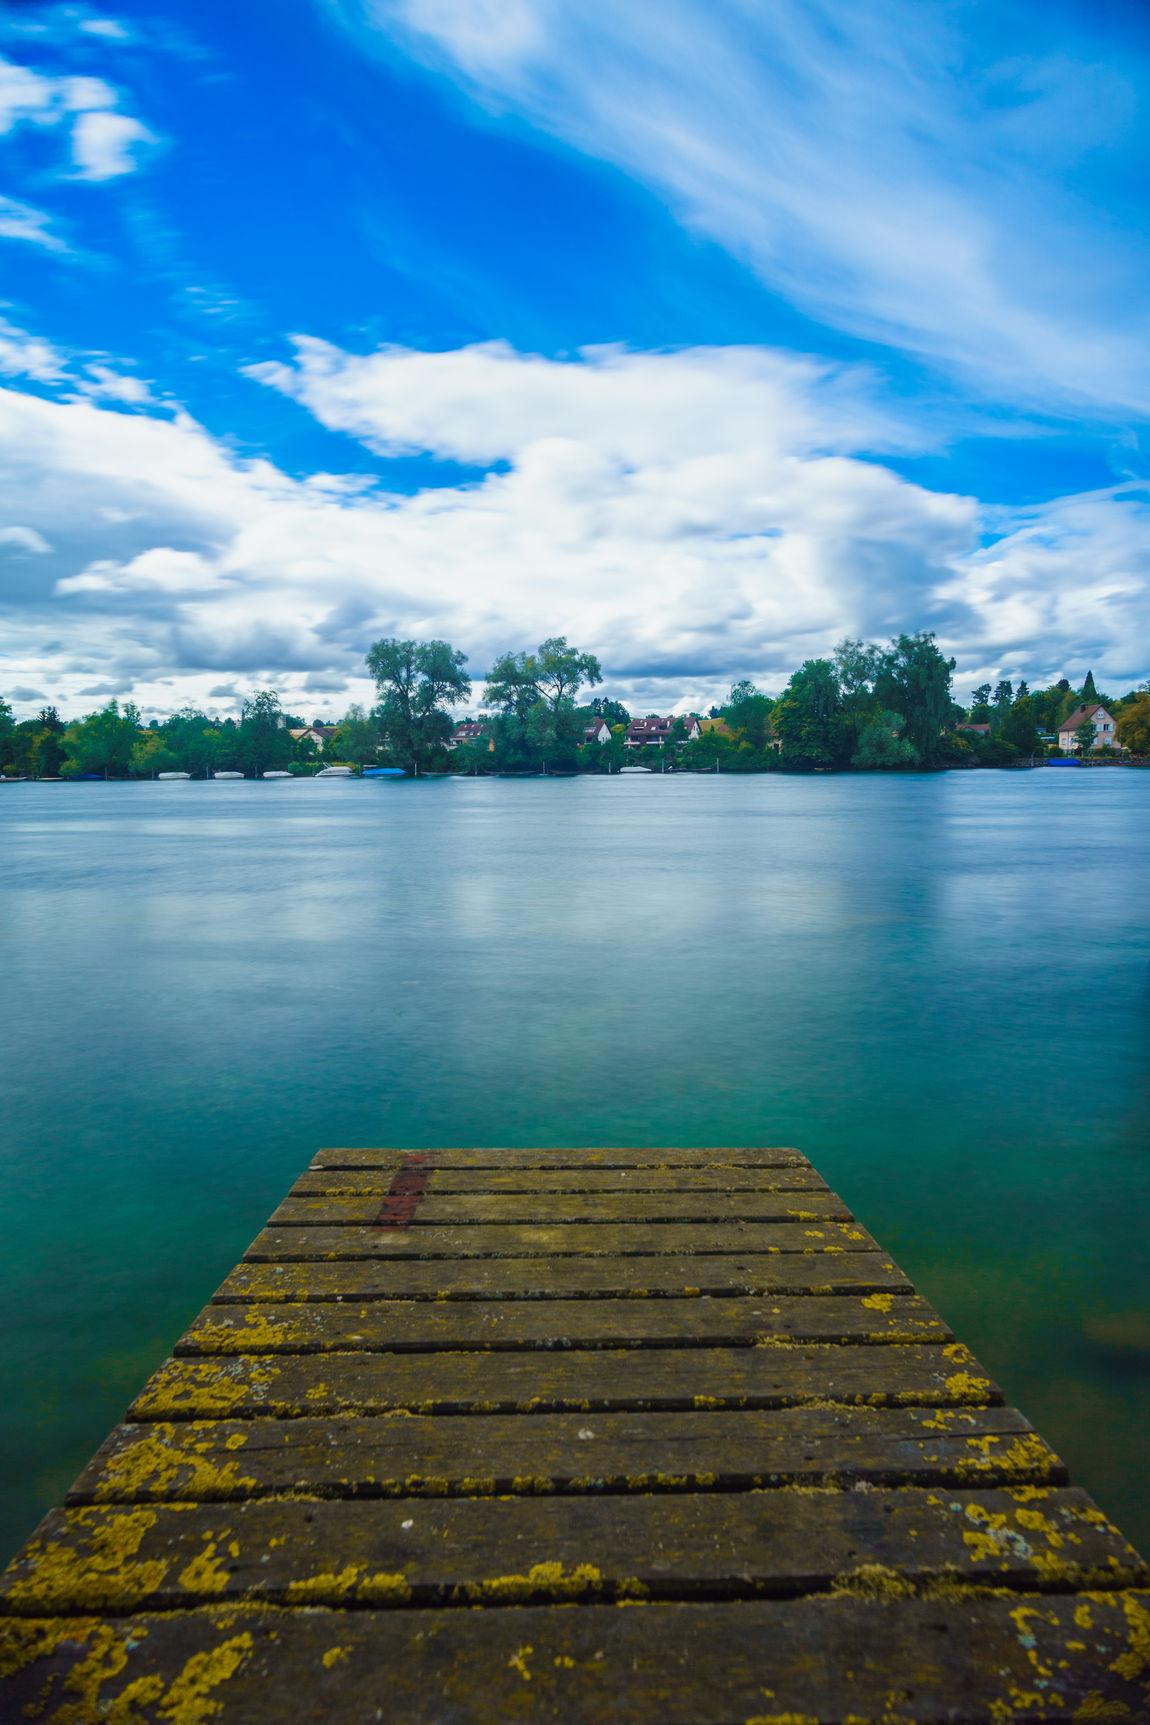 #Blue #Forward #greatmoment #landscape #mirror #Nature  #nopeople #Rhein #water #way